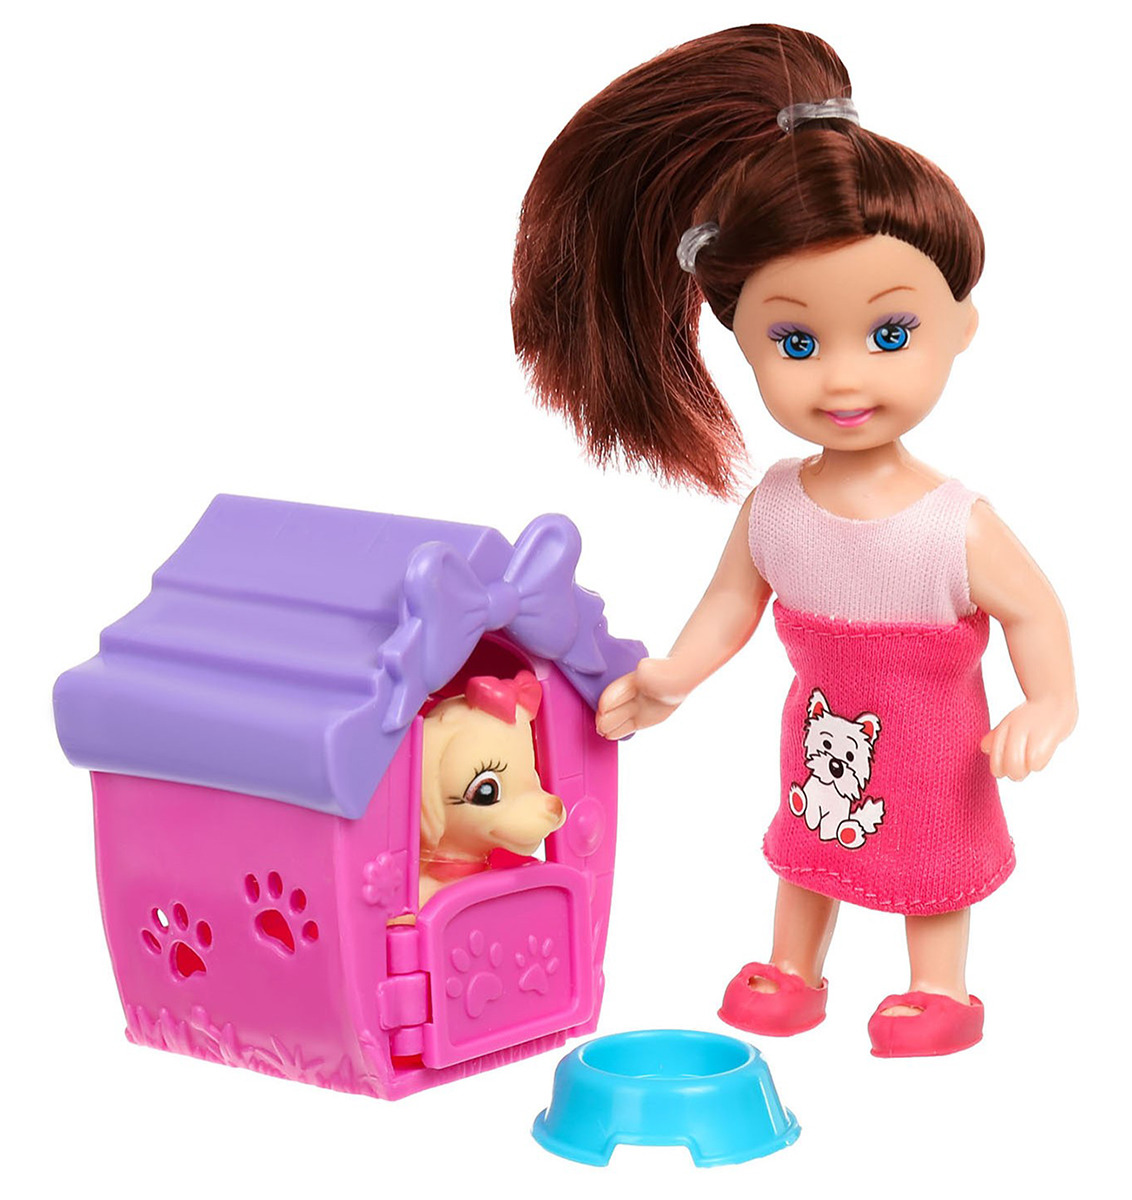 "Кукла-малышка ""Ева"", 2902005, с собачкой, с аксессуарами, 10 см"